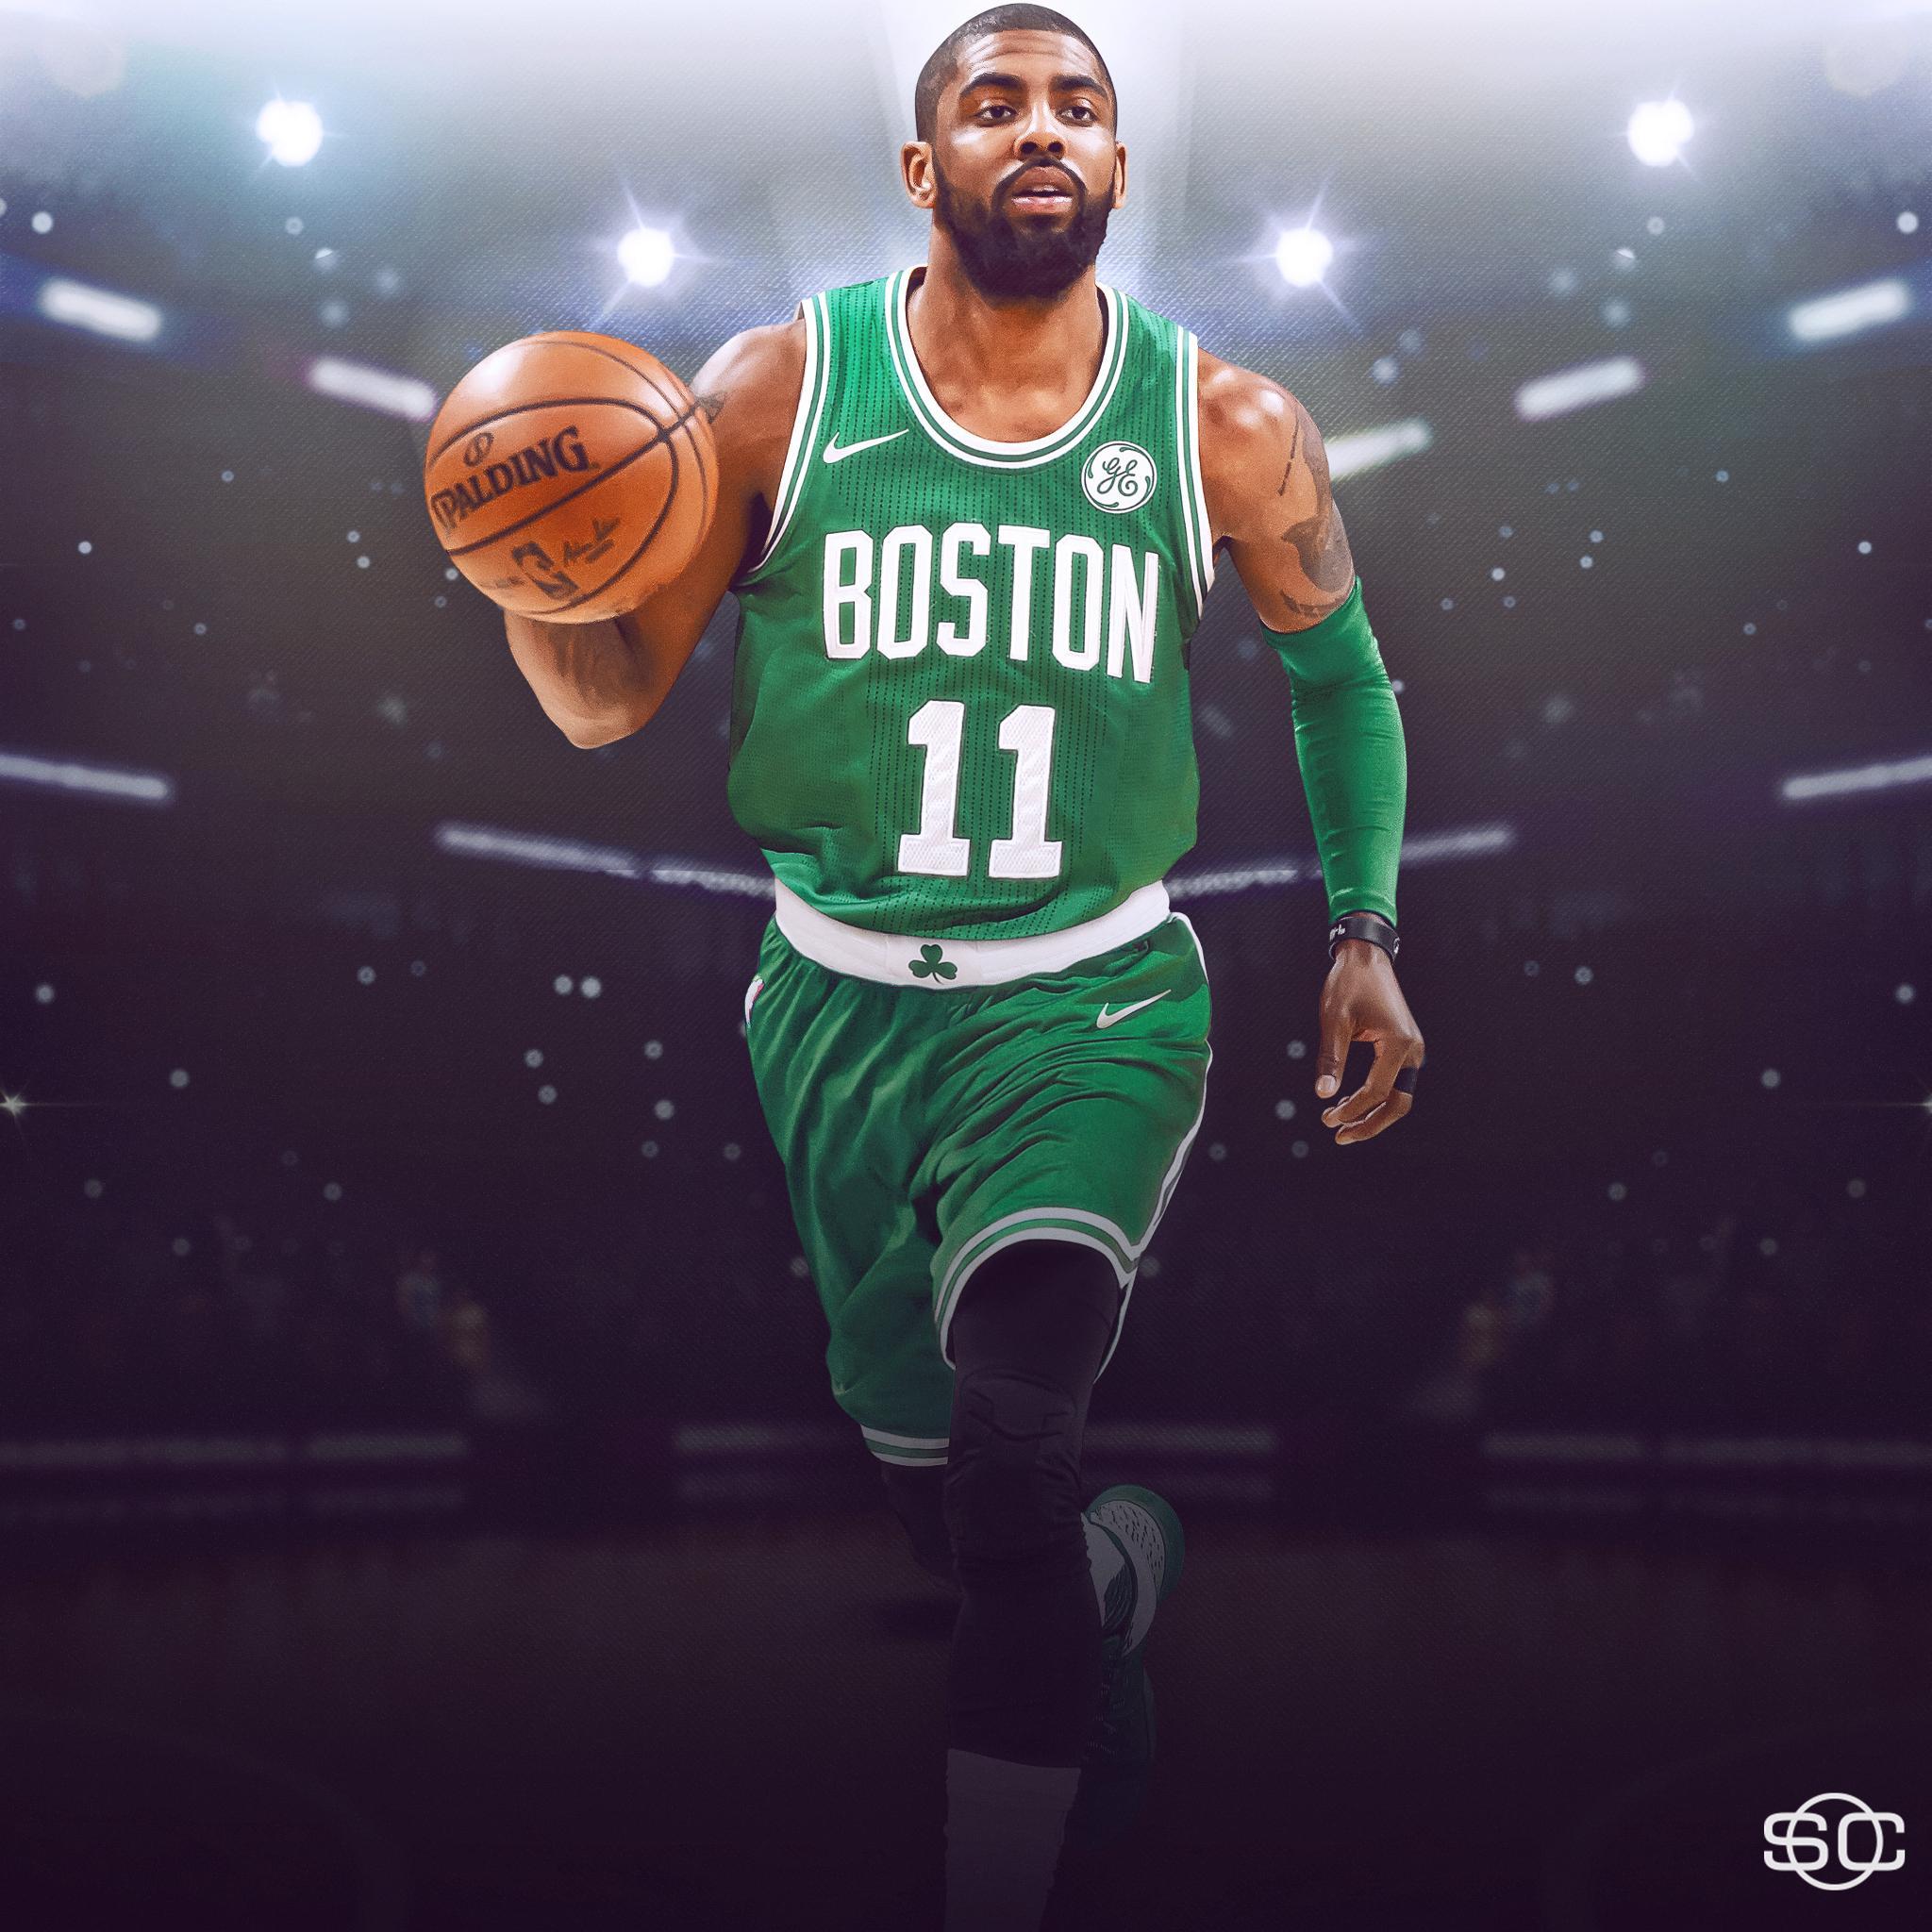 The Celtics open the 2017-18 season in Cleveland. �� https://t.co/R4VvJ67NO9